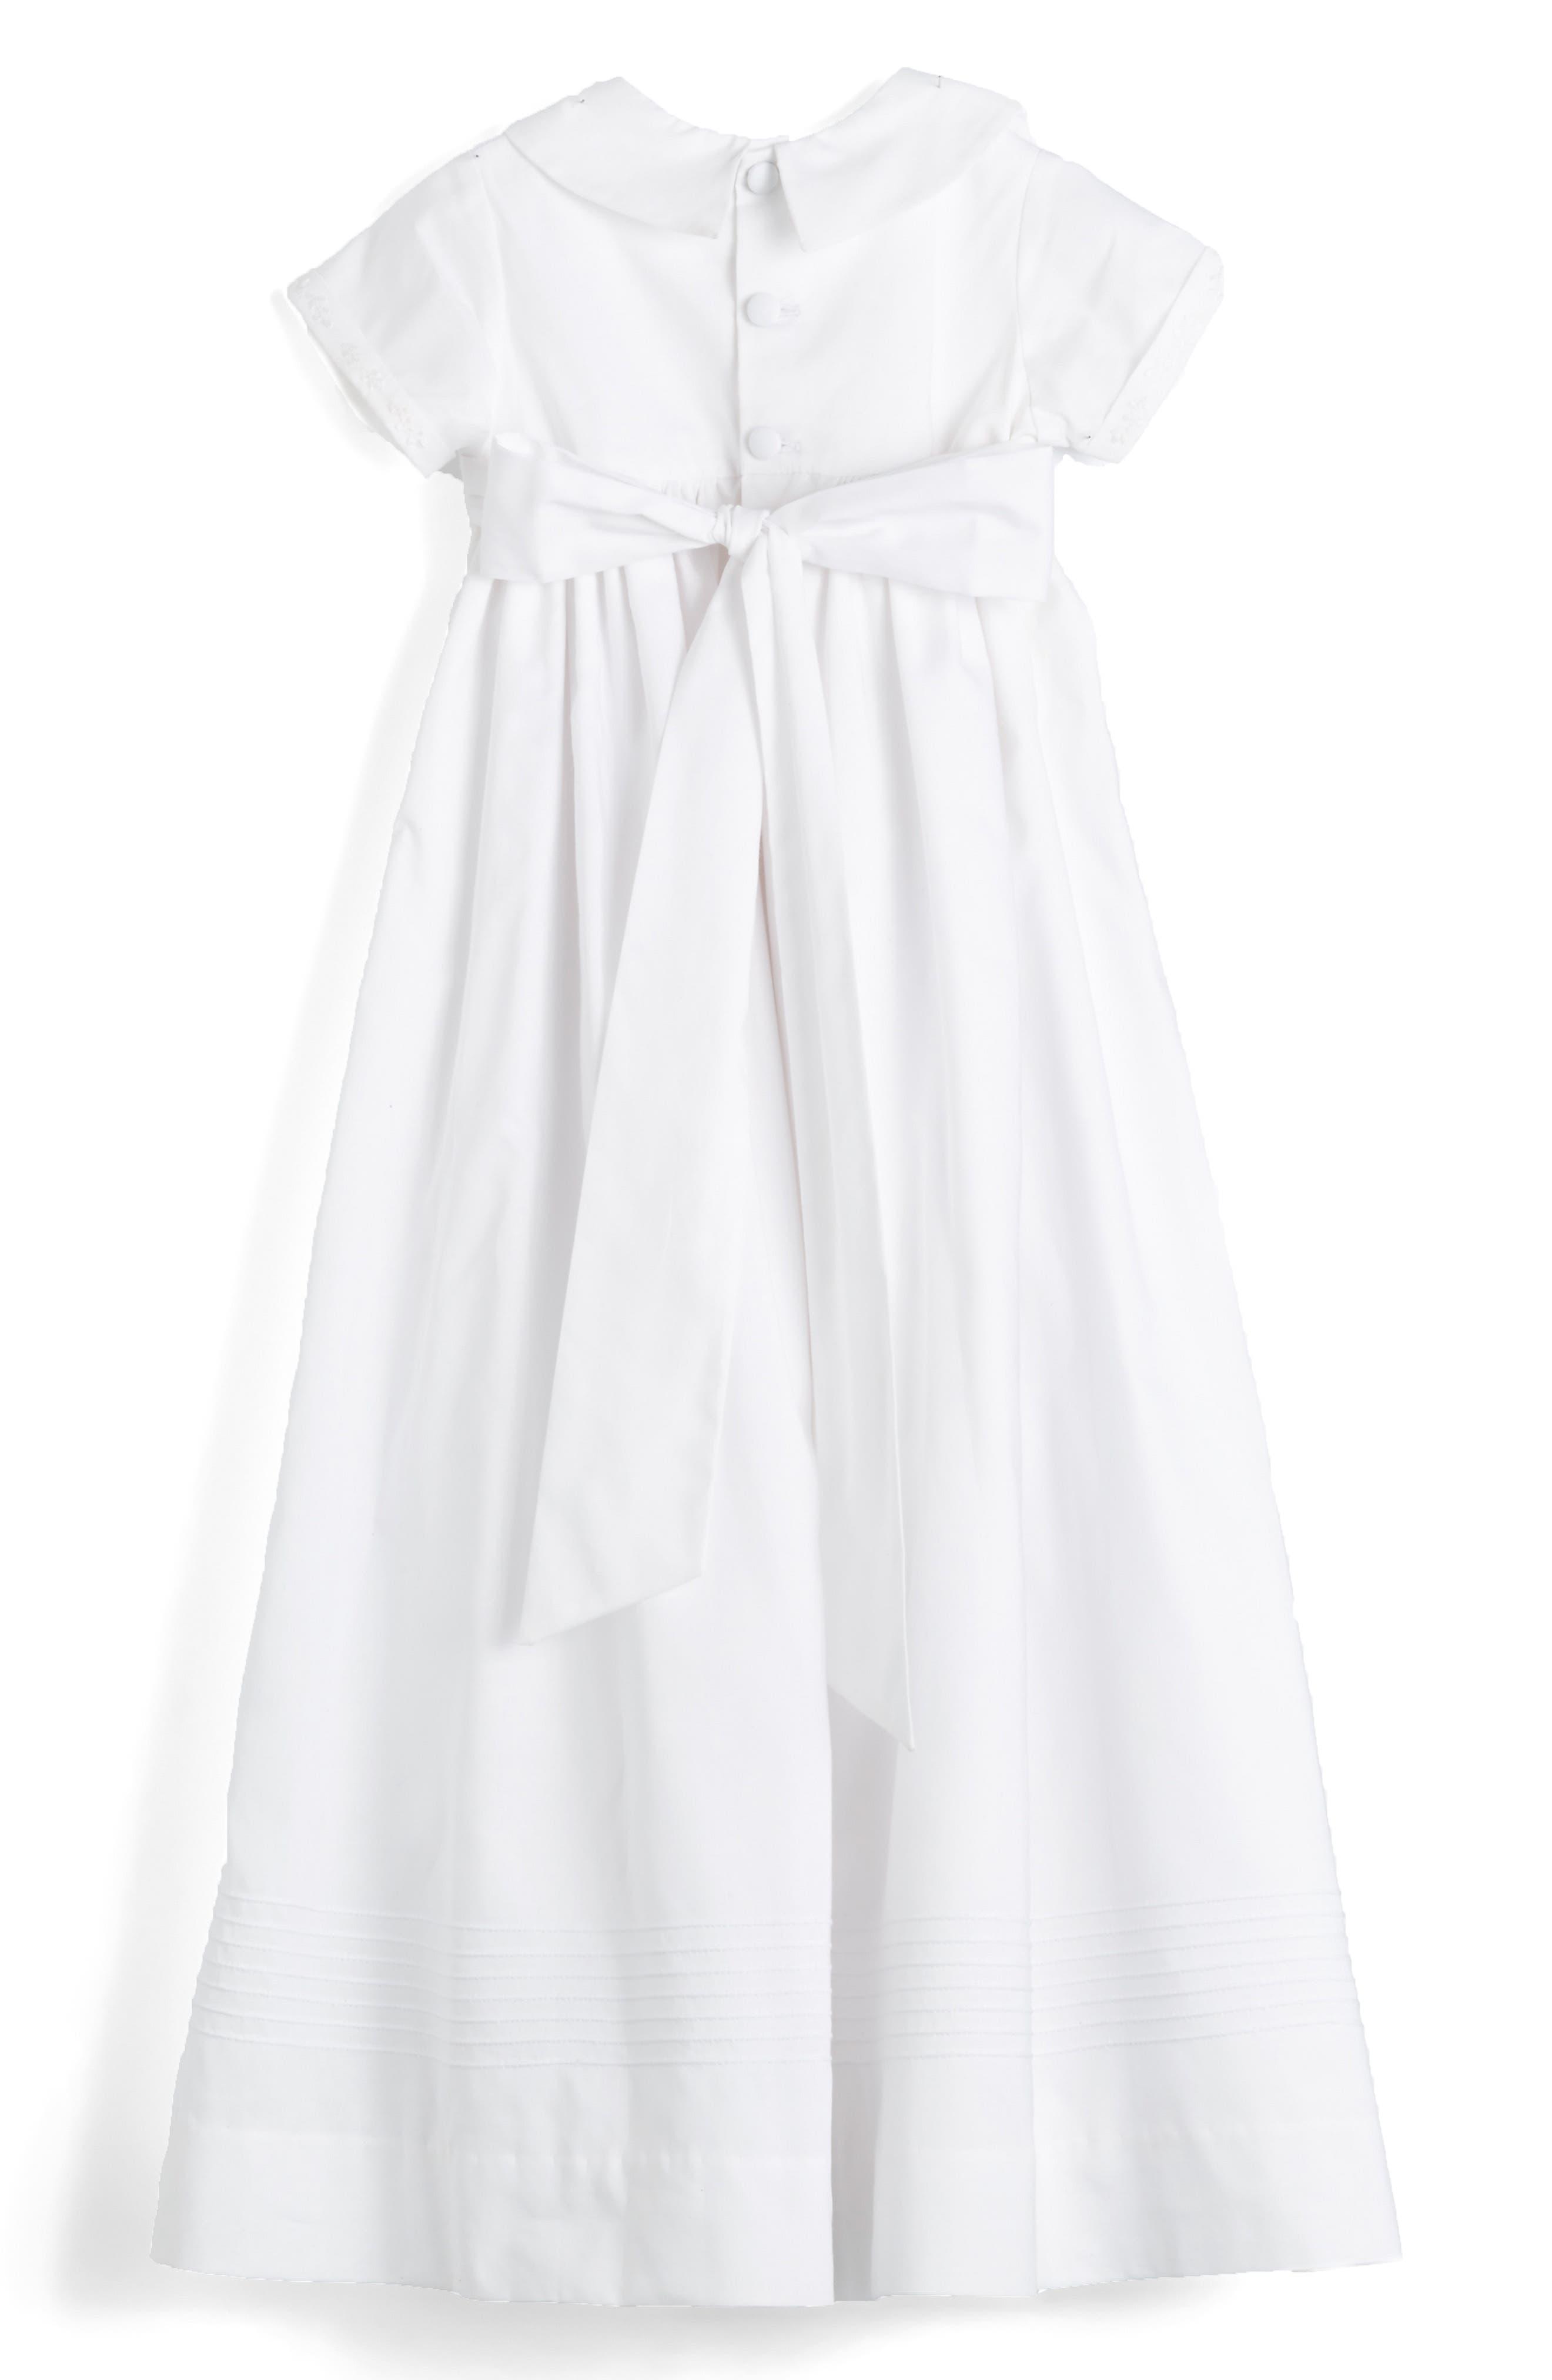 'Classic' Christening Gown & Bonnet,                             Alternate thumbnail 2, color,                             WHITE